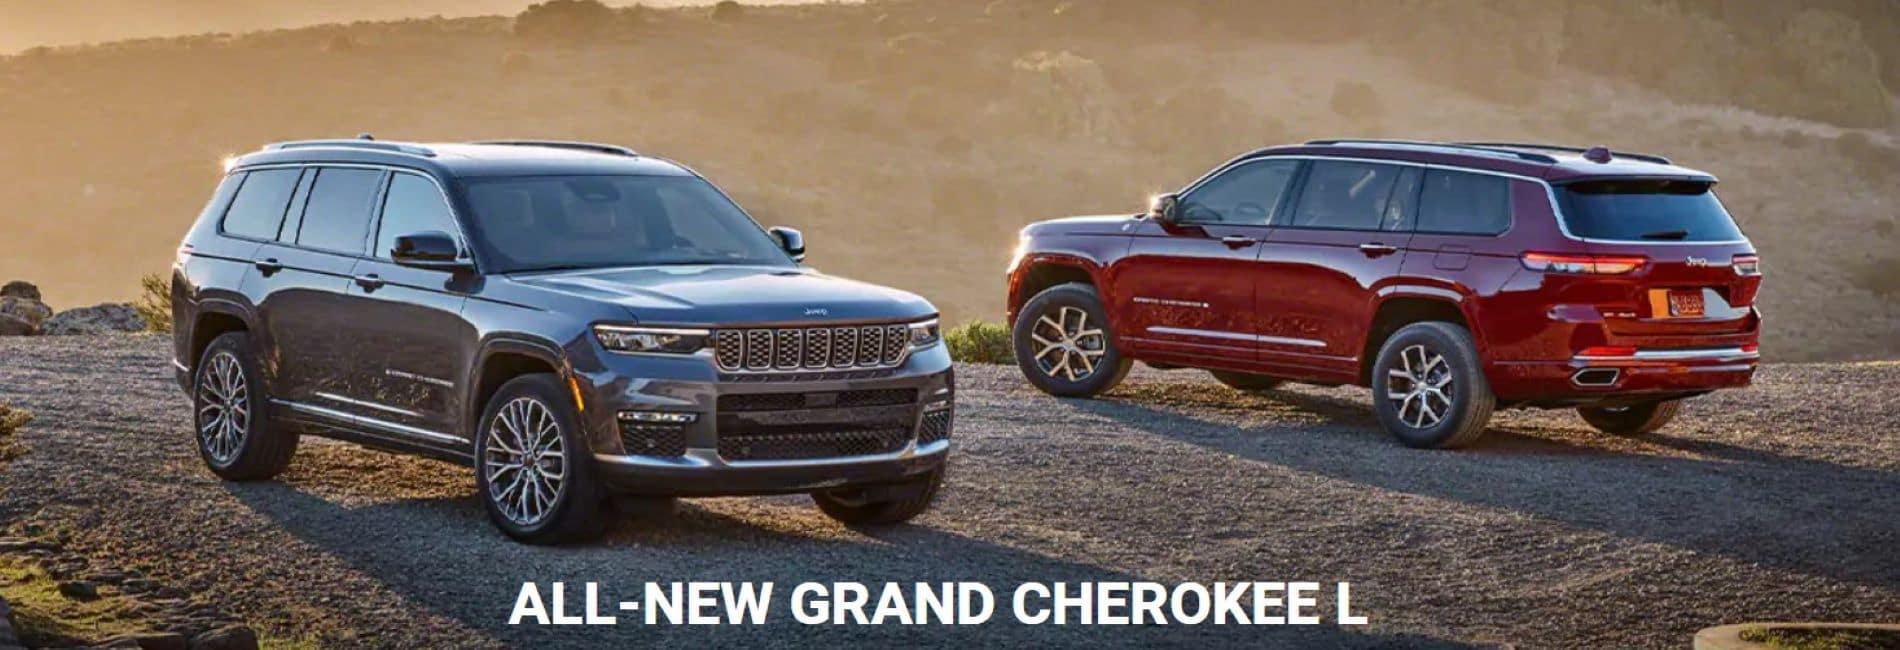 Grand Cherokee L 2